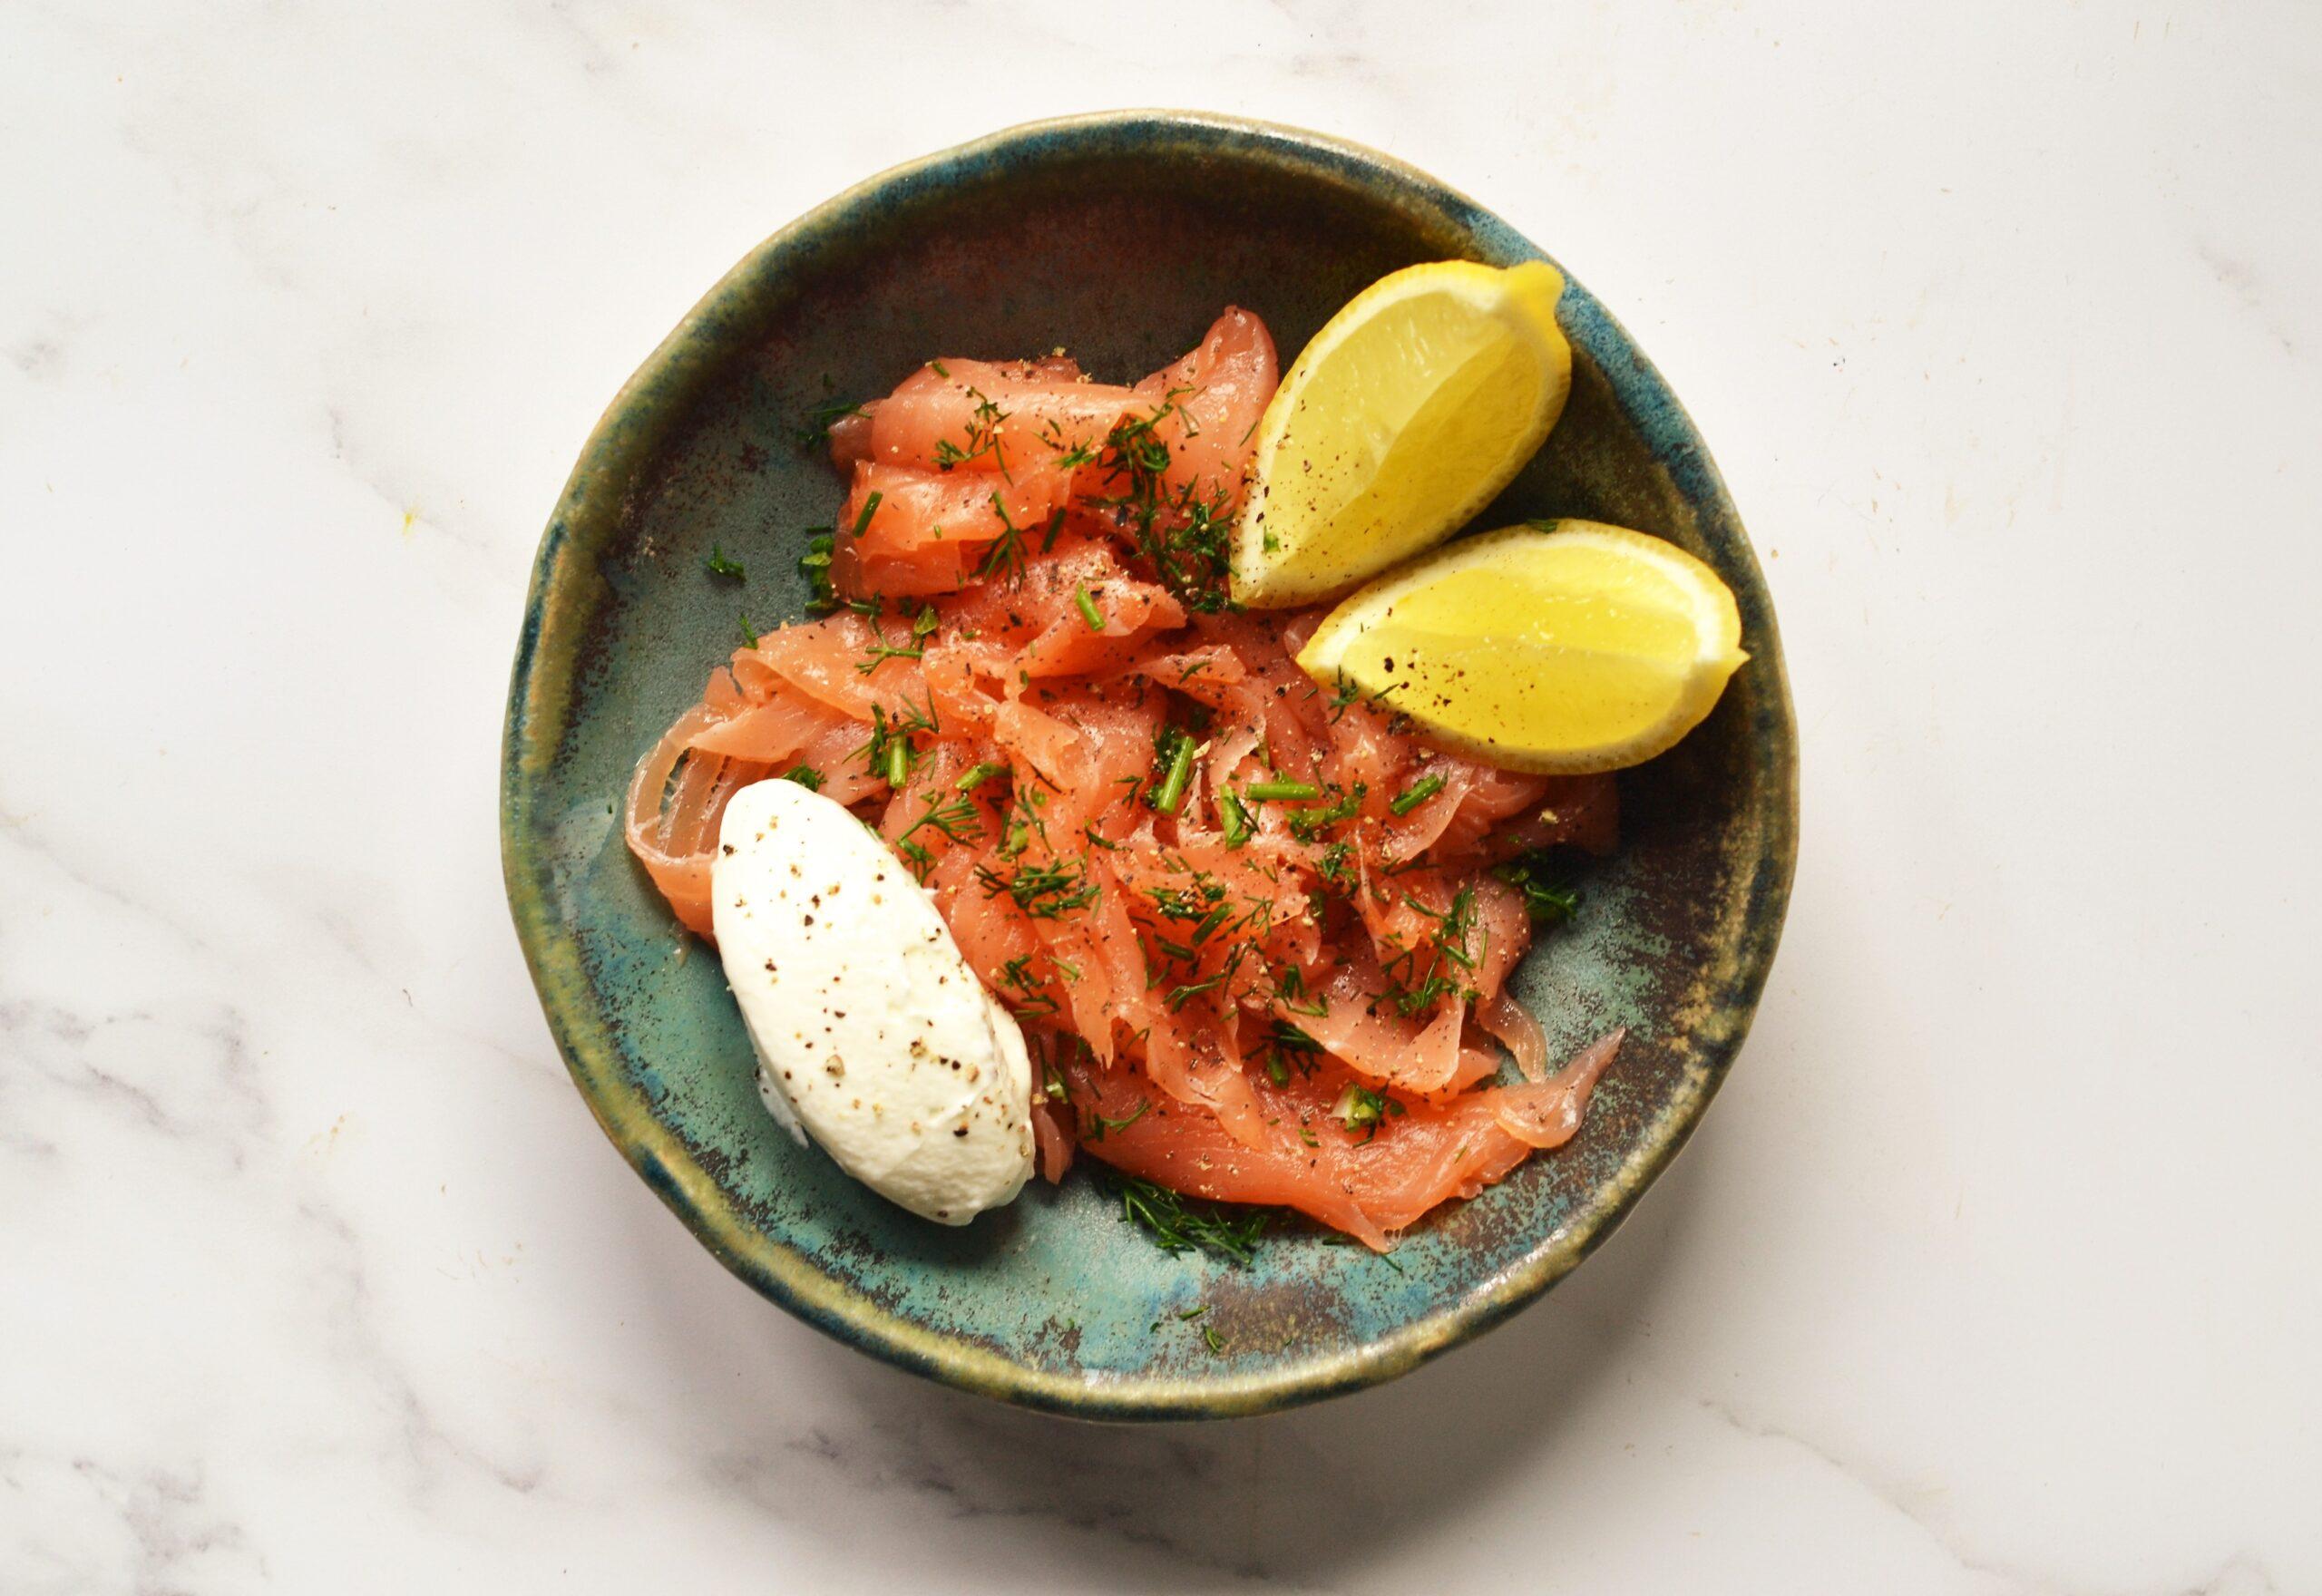 Lussmanns takeaway service smoked salmon | Image credit Bitten Oxford